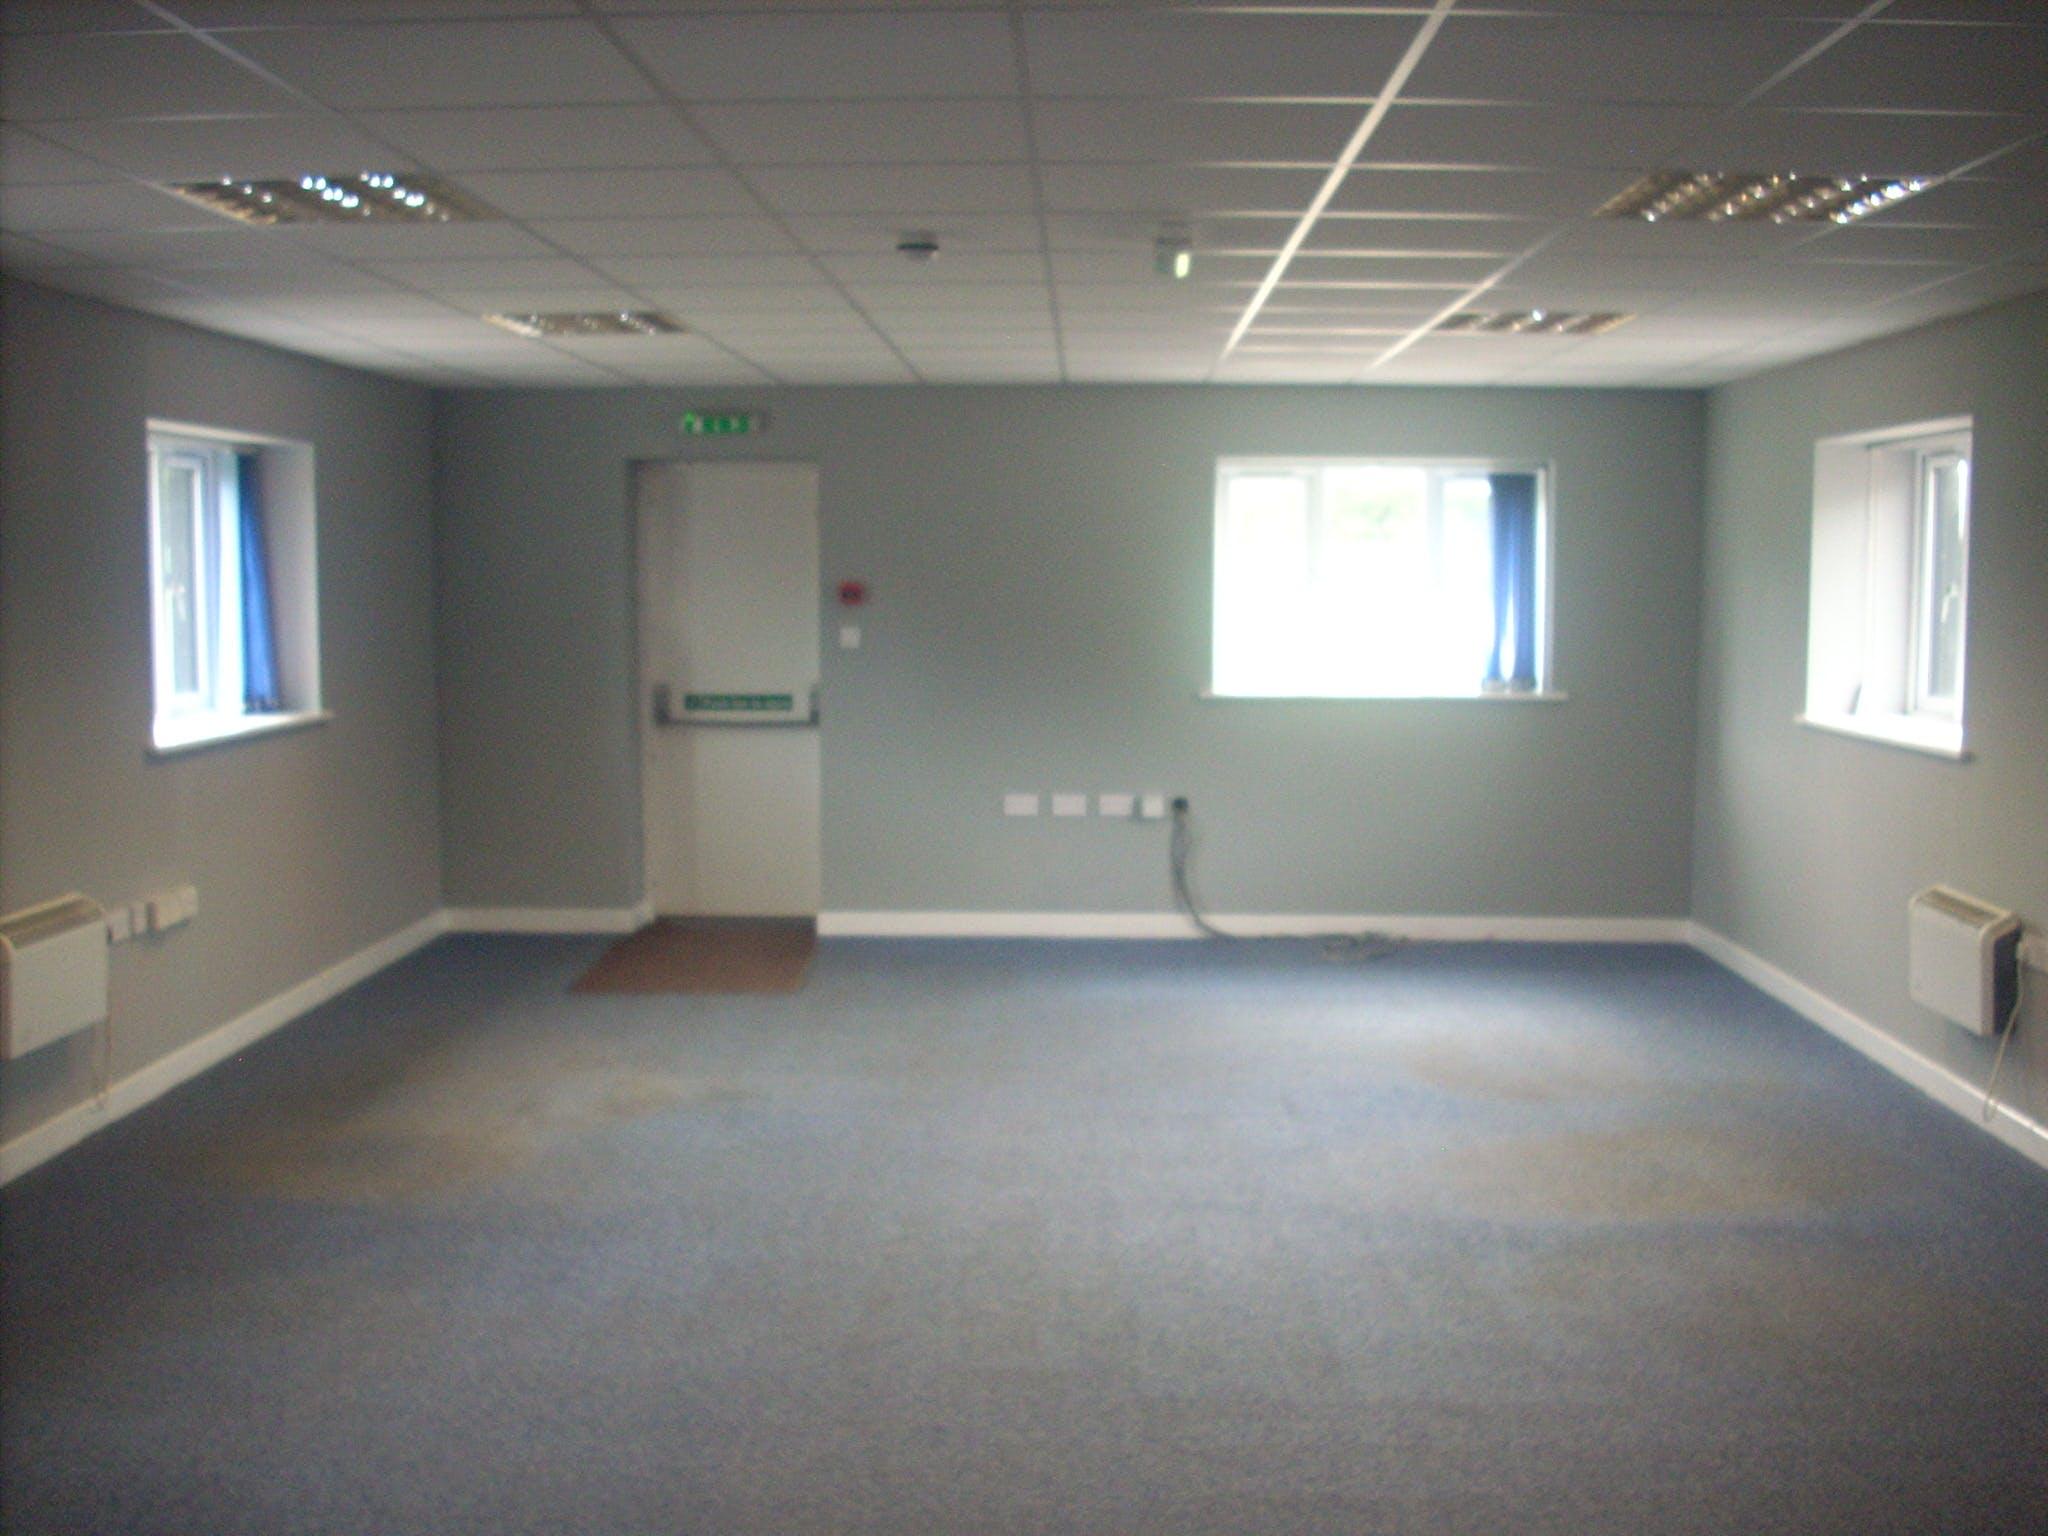 Unit 6, Wyvols Court Farm, Reading, Offices To Let - 6 Wyvols Court internal.JPG